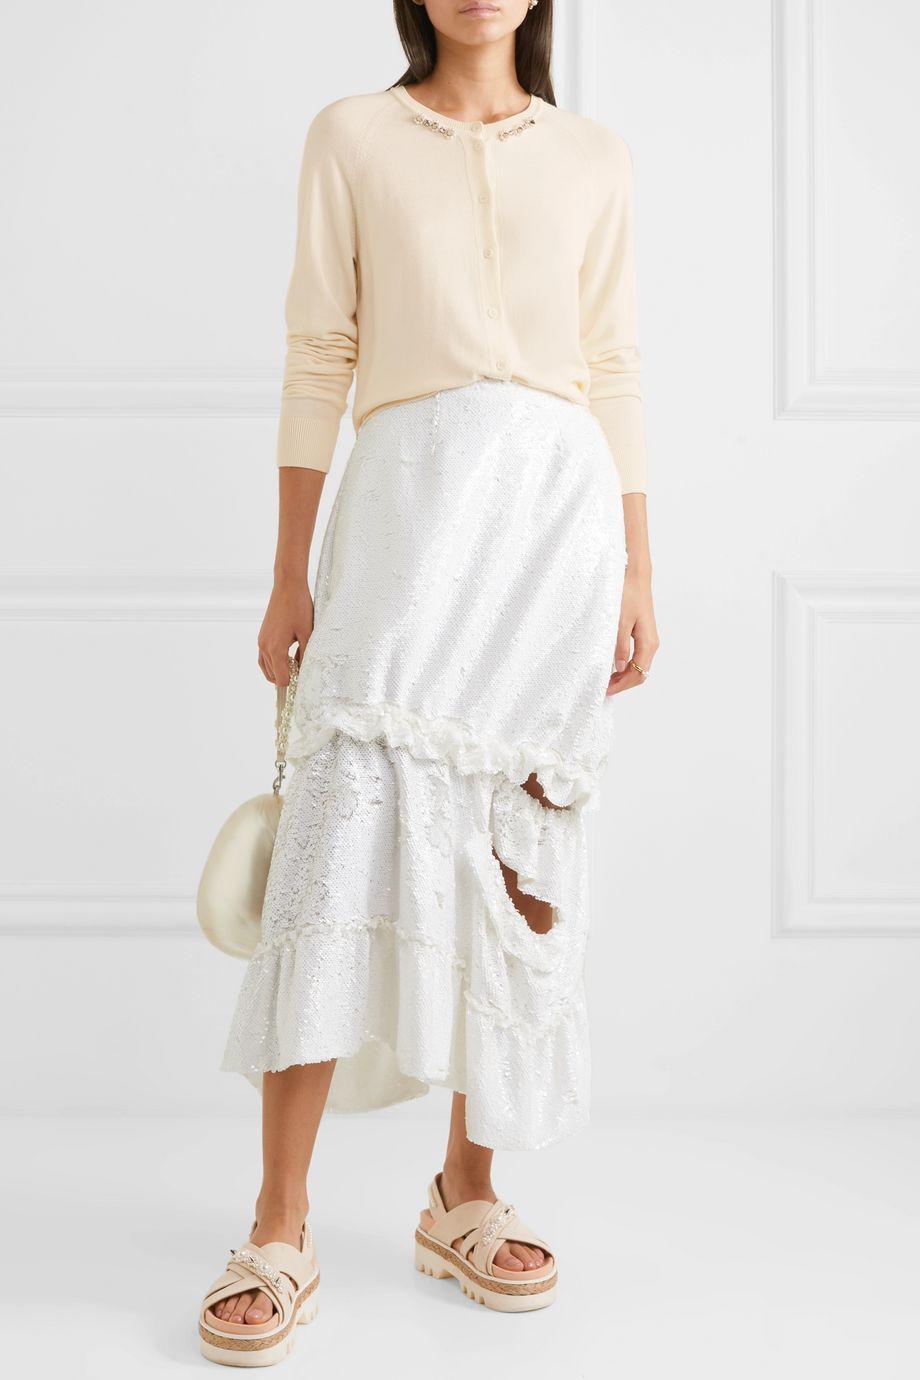 Simone Rocha Bite Back embellished ruffled cutout wool and silk-blend cardigan